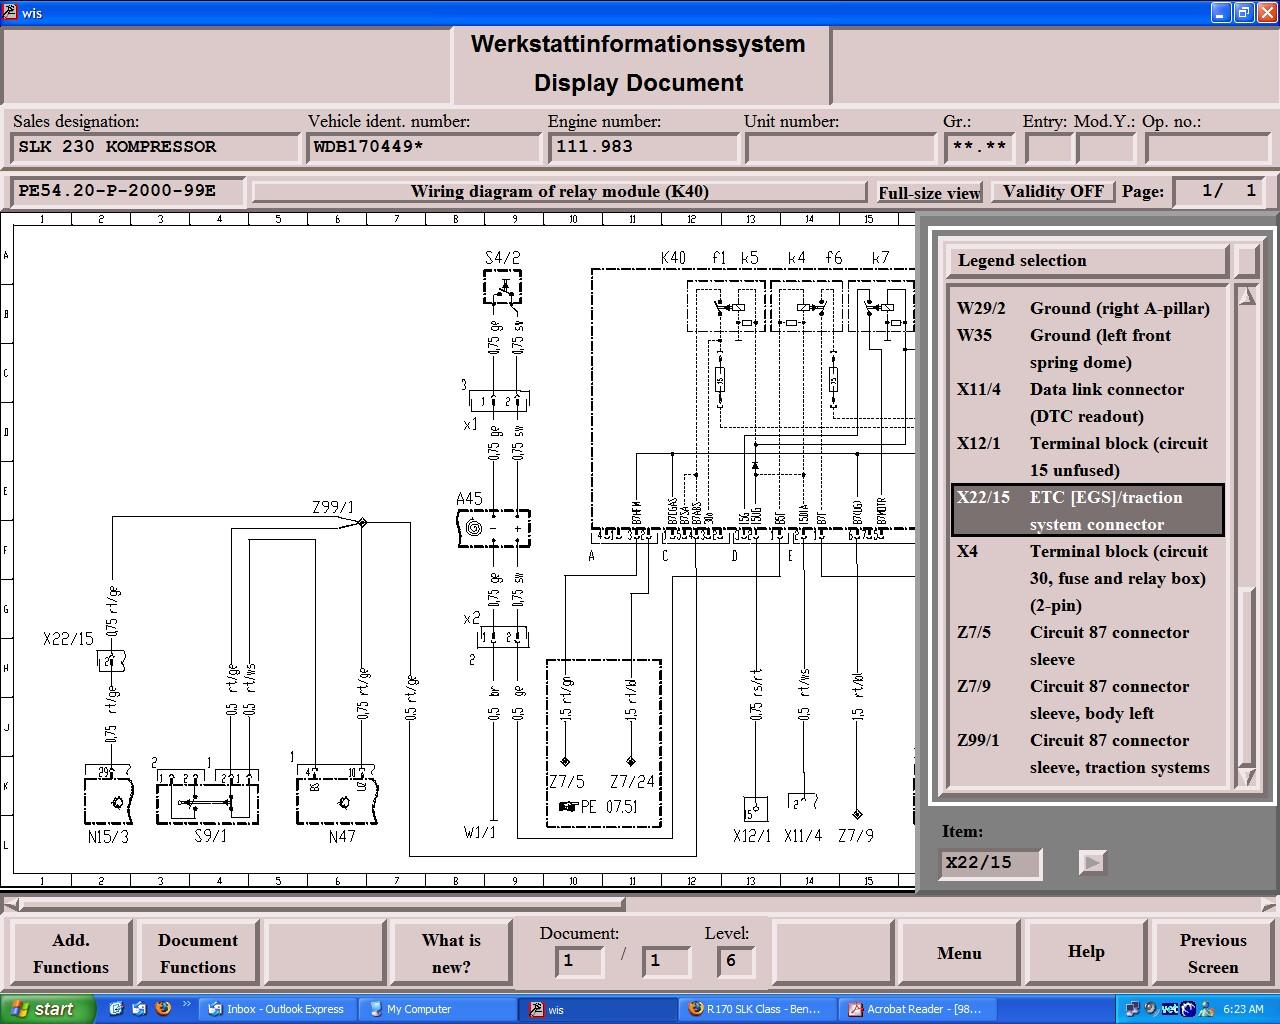 11 Wrx Ecu Wiring Diagram K40 Relay Circuit And Associated Mercedes Benz Forum